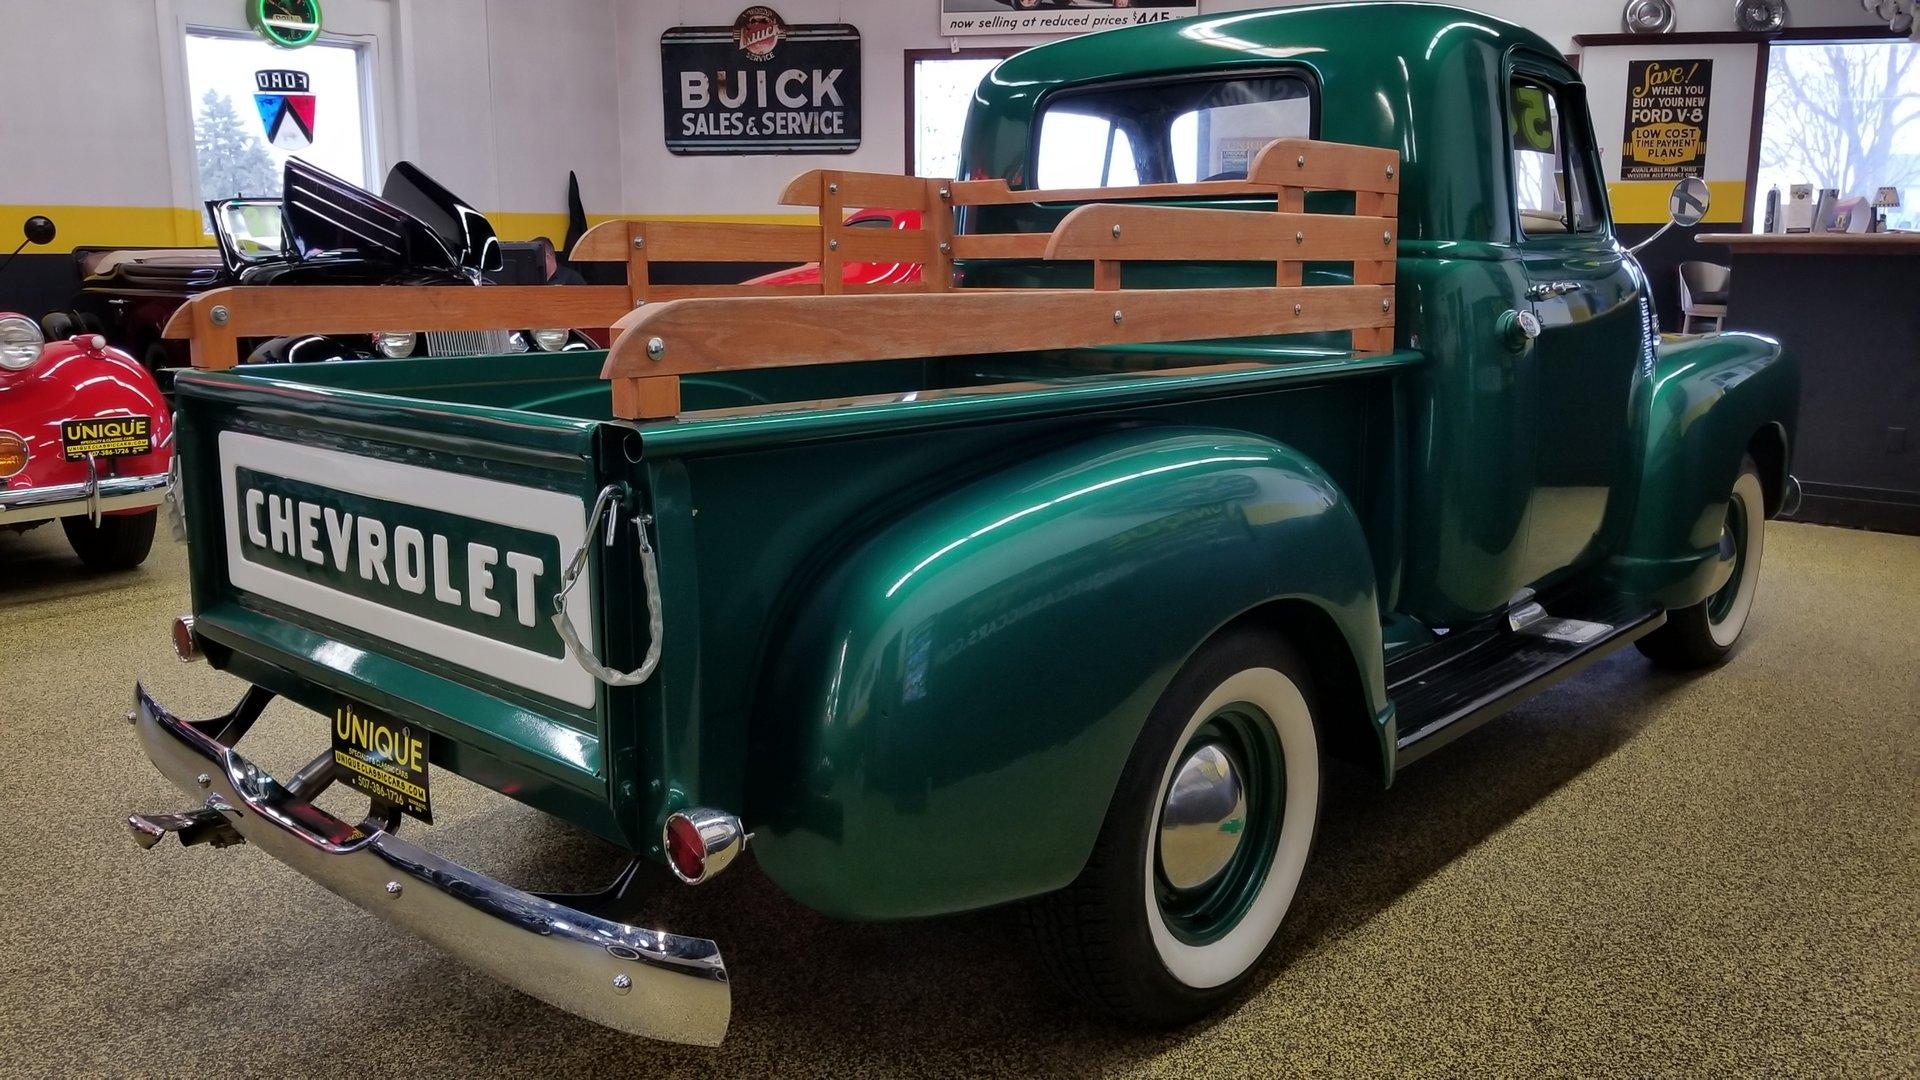 1954 Chevrolet 3100 Pickup For Sale 110573 Mcg Truck